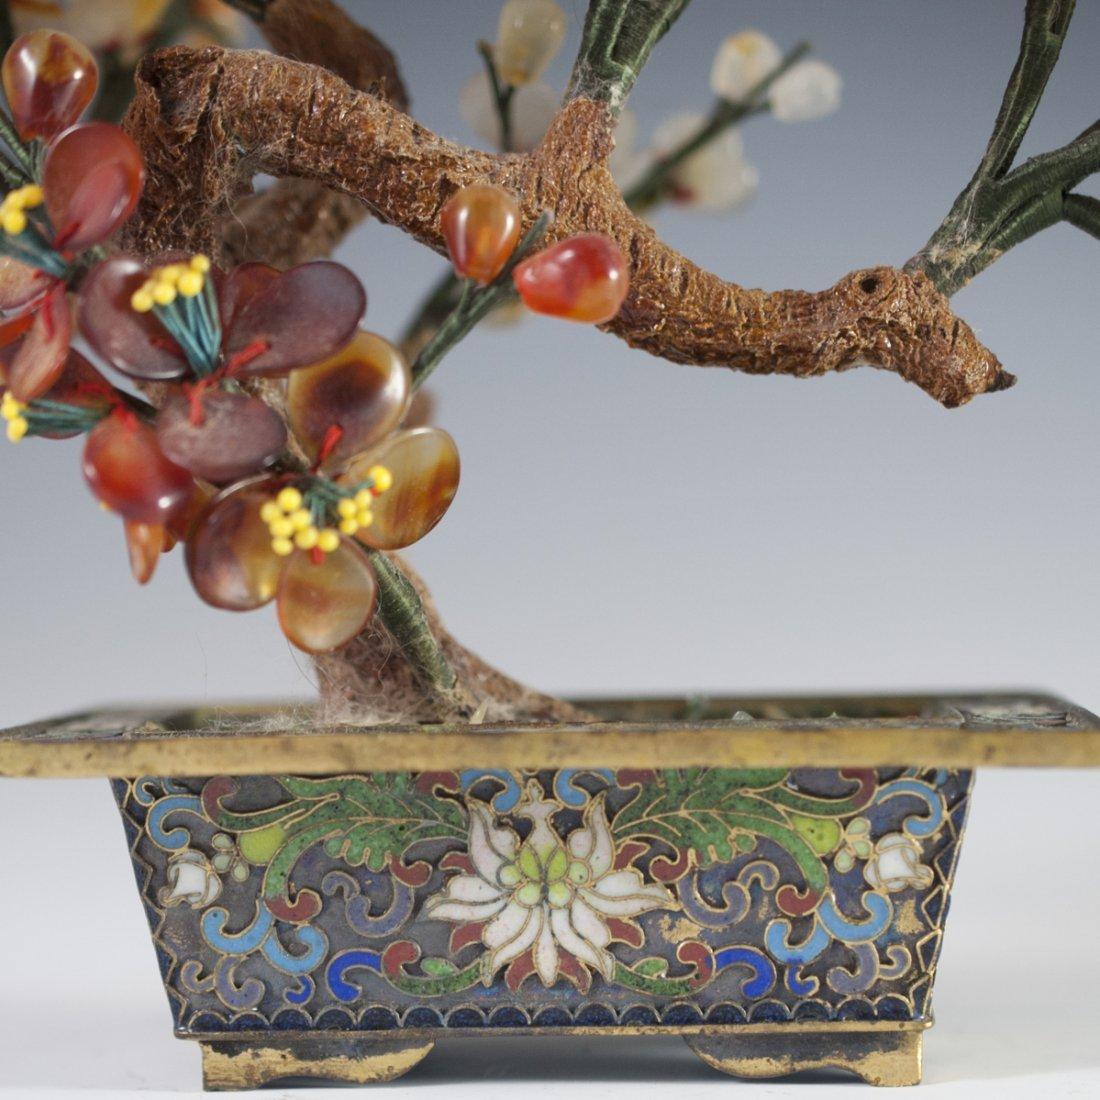 Chinese Enameled Cloissone Agate Bonsai Trees - 4